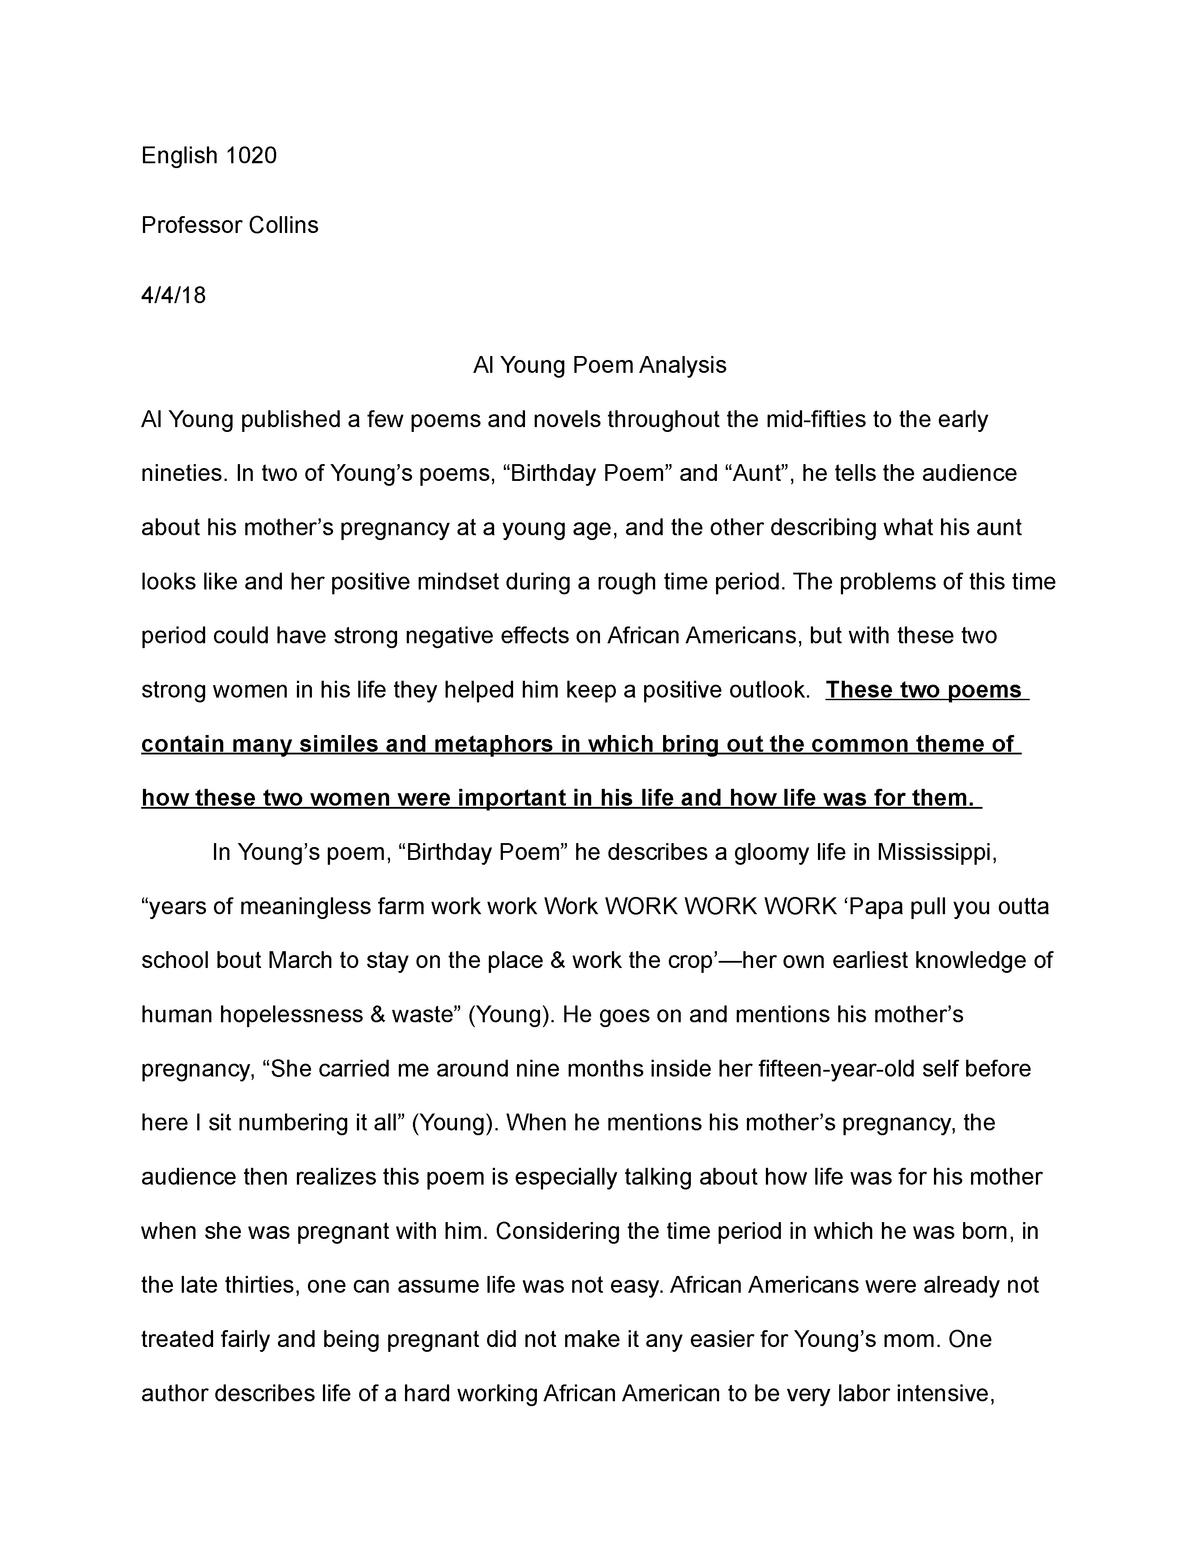 English 1020 Al Young essay - ENGL 1020: English Composition